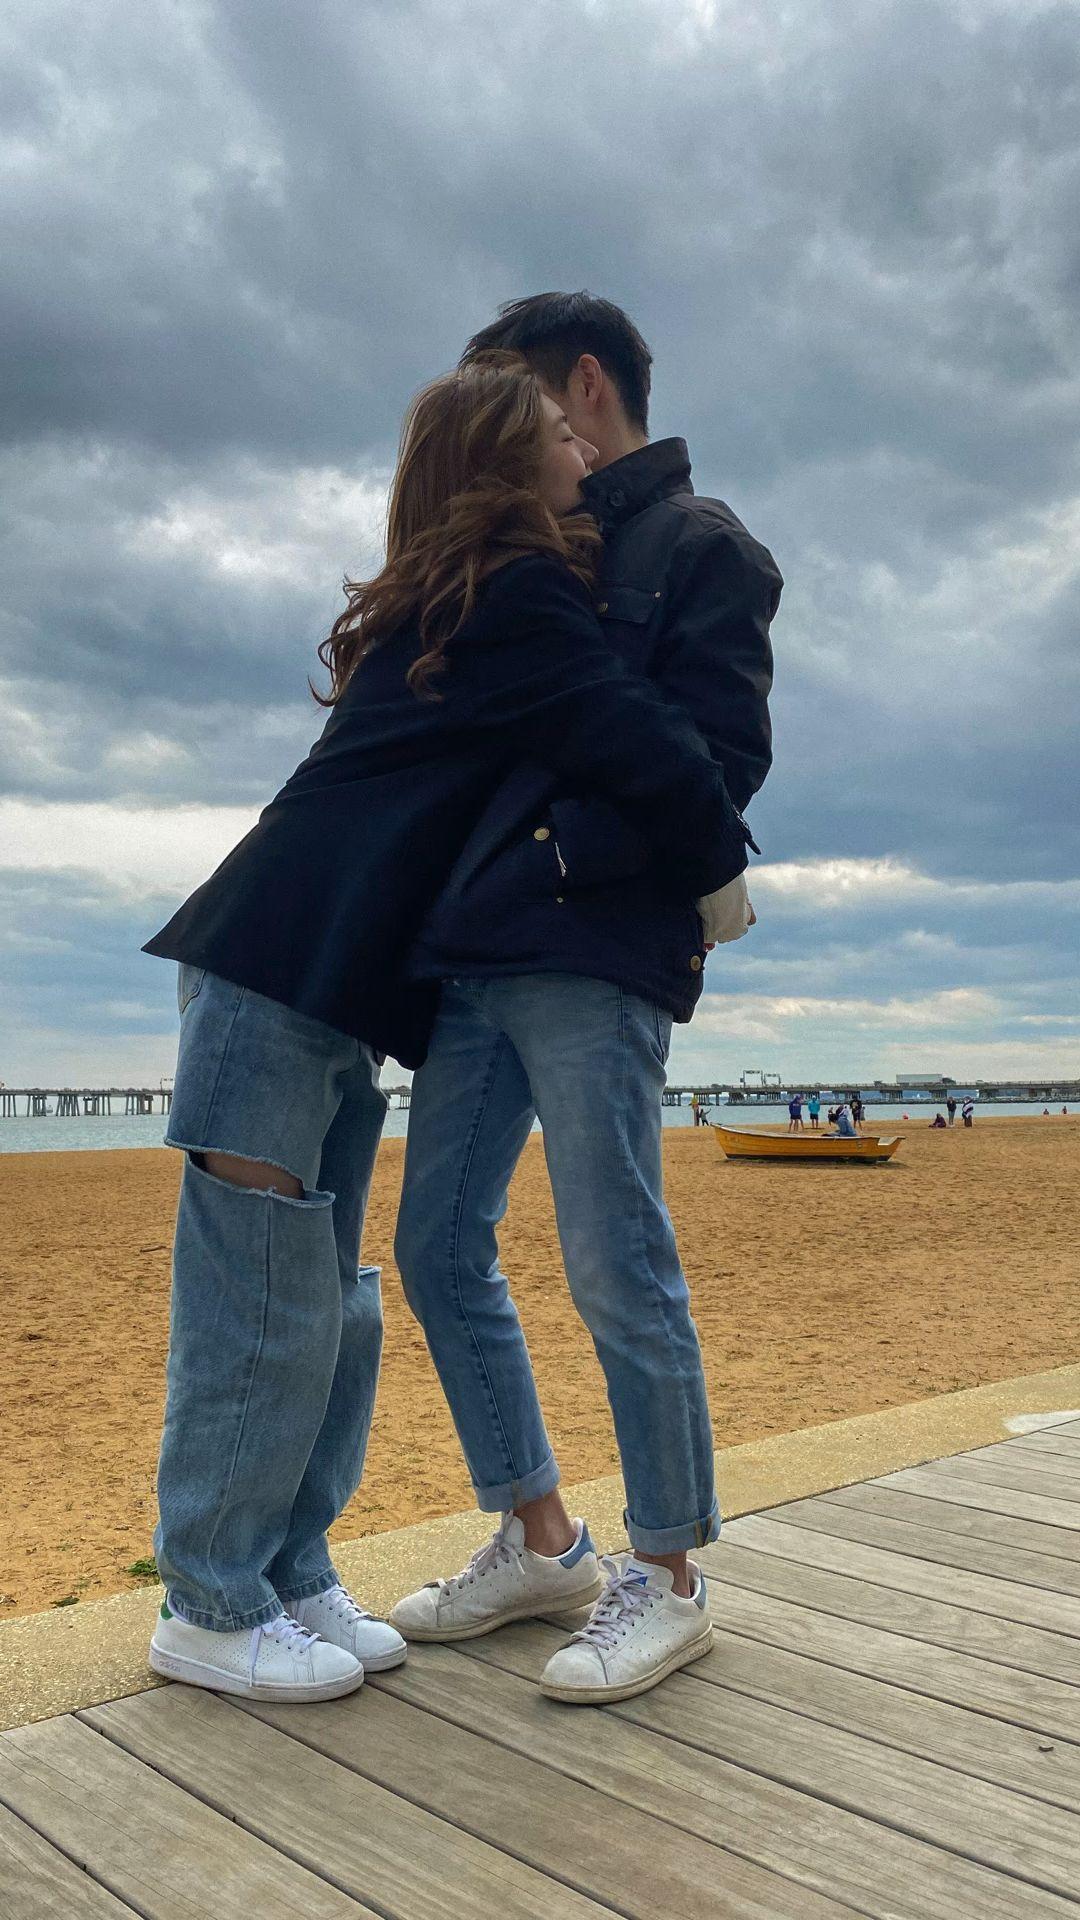 Couple beach pic inspo 🤍 ig: @elli3phant